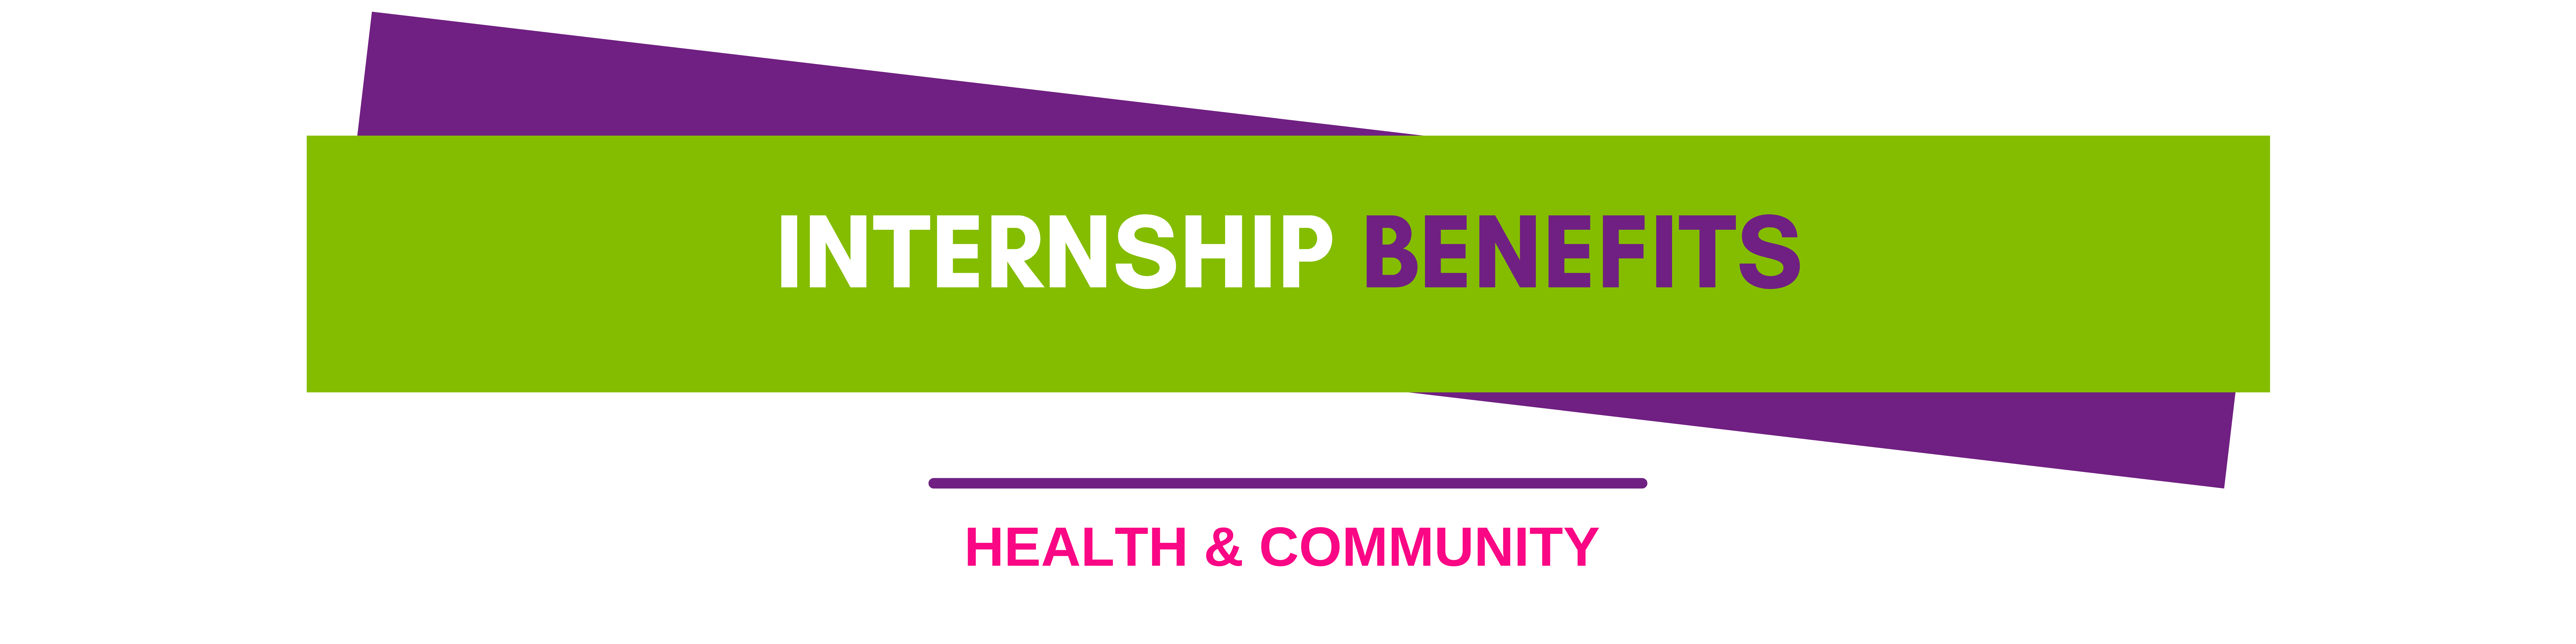 Internship-Benefits-Assuaged